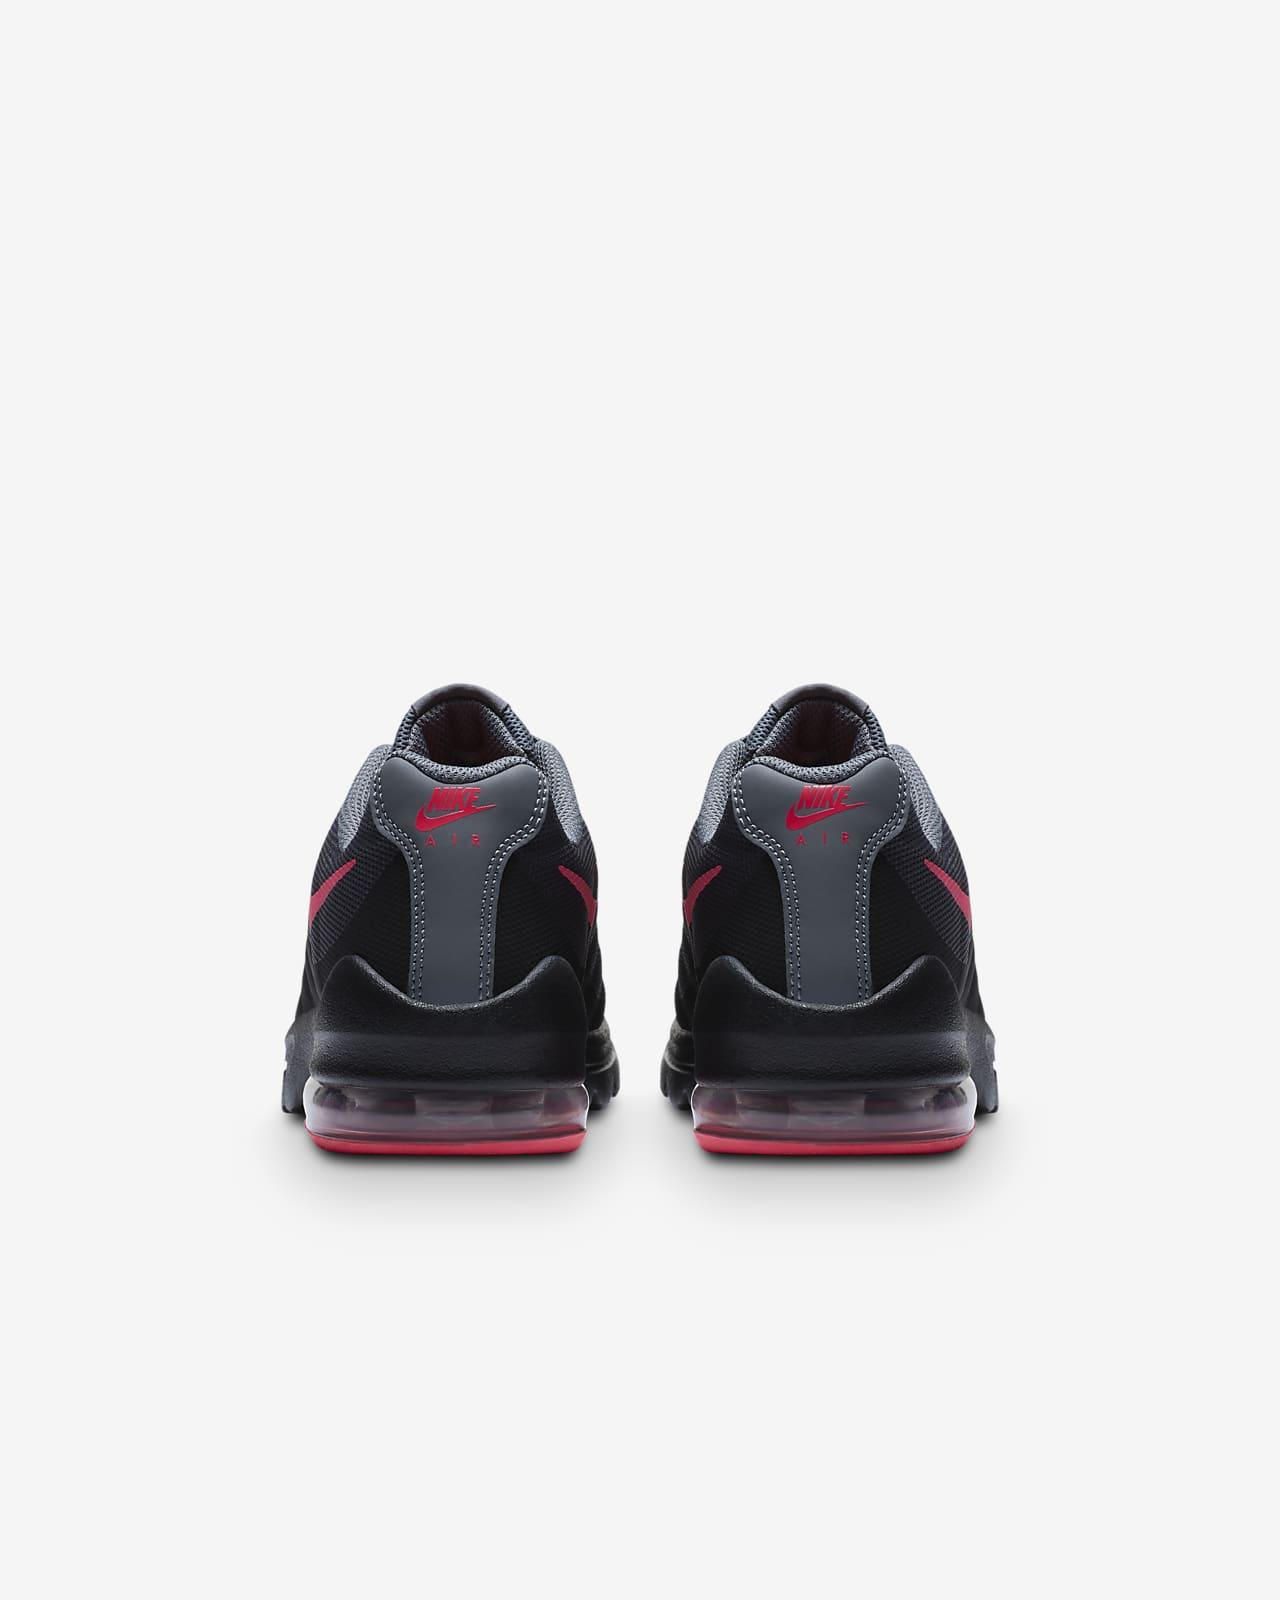 chaussure nike enfant 3 ans